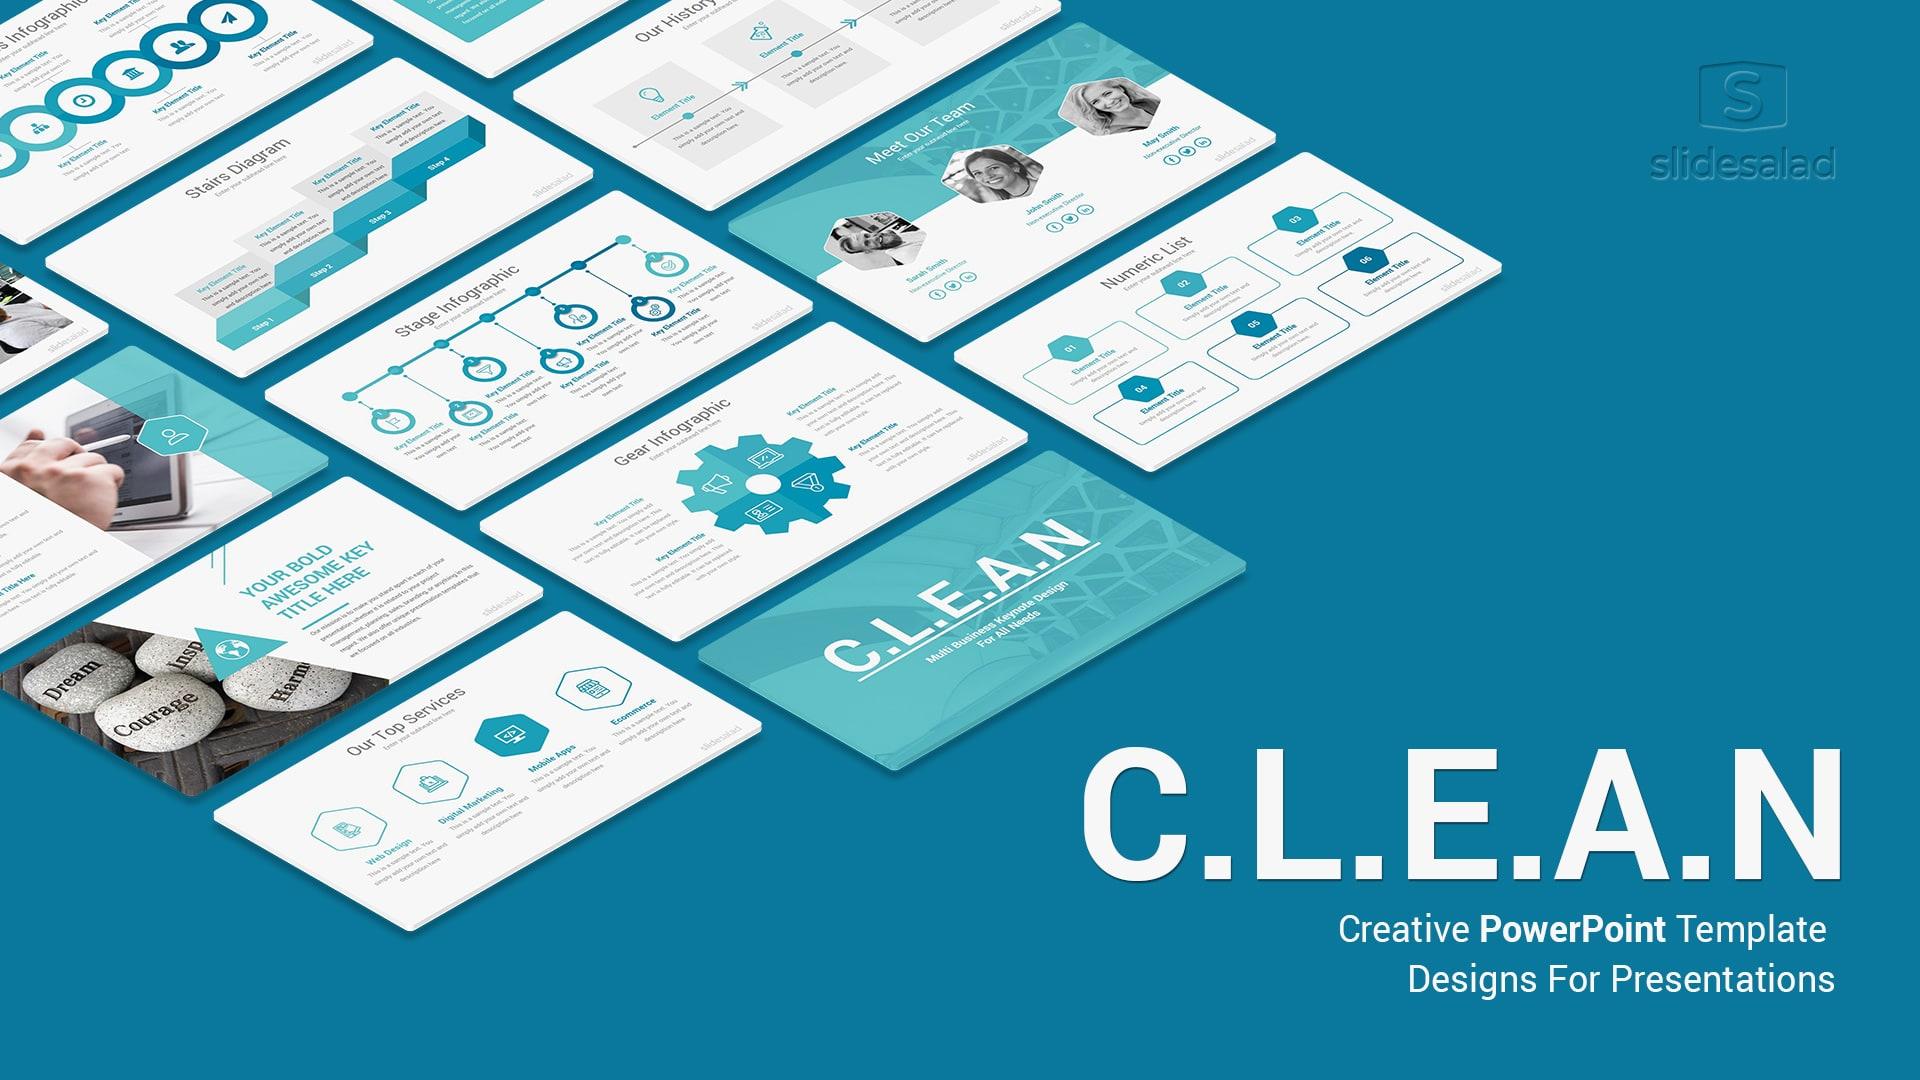 Clean Business PowerPoint Templates – Sleek PowerPoint Templates